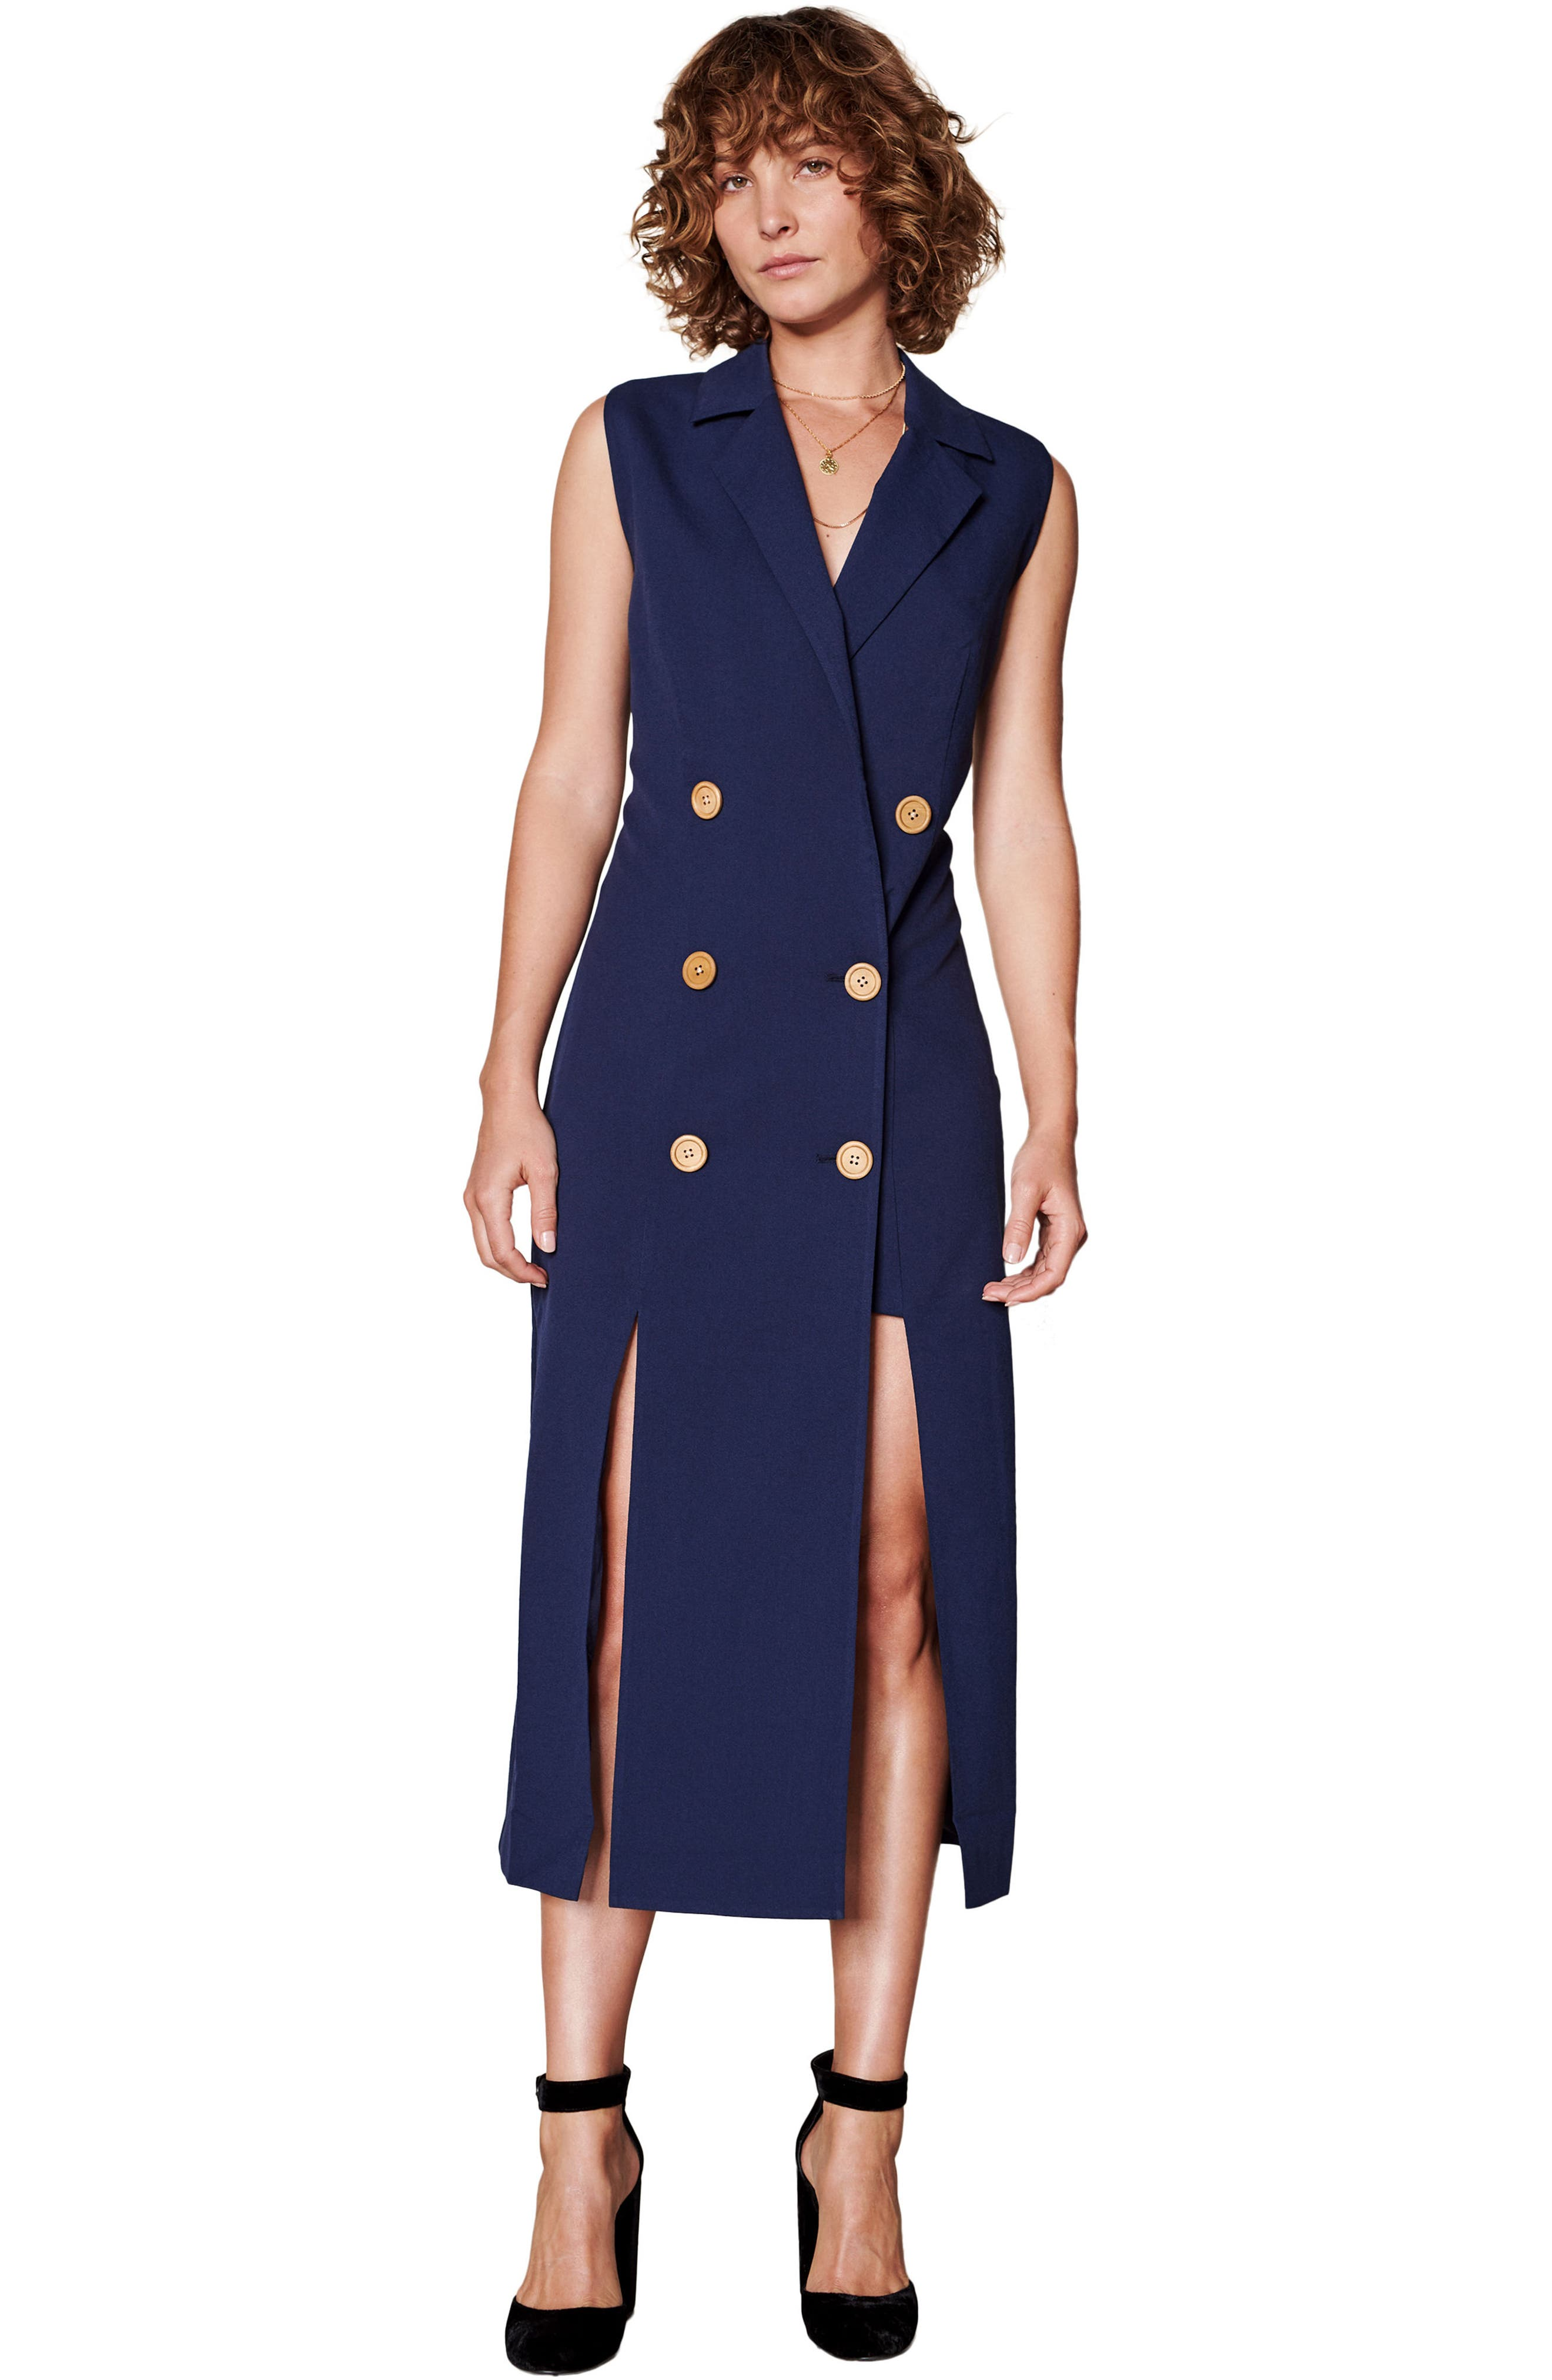 Brigitte Midi Dress,                             Alternate thumbnail 8, color,                             NAVY